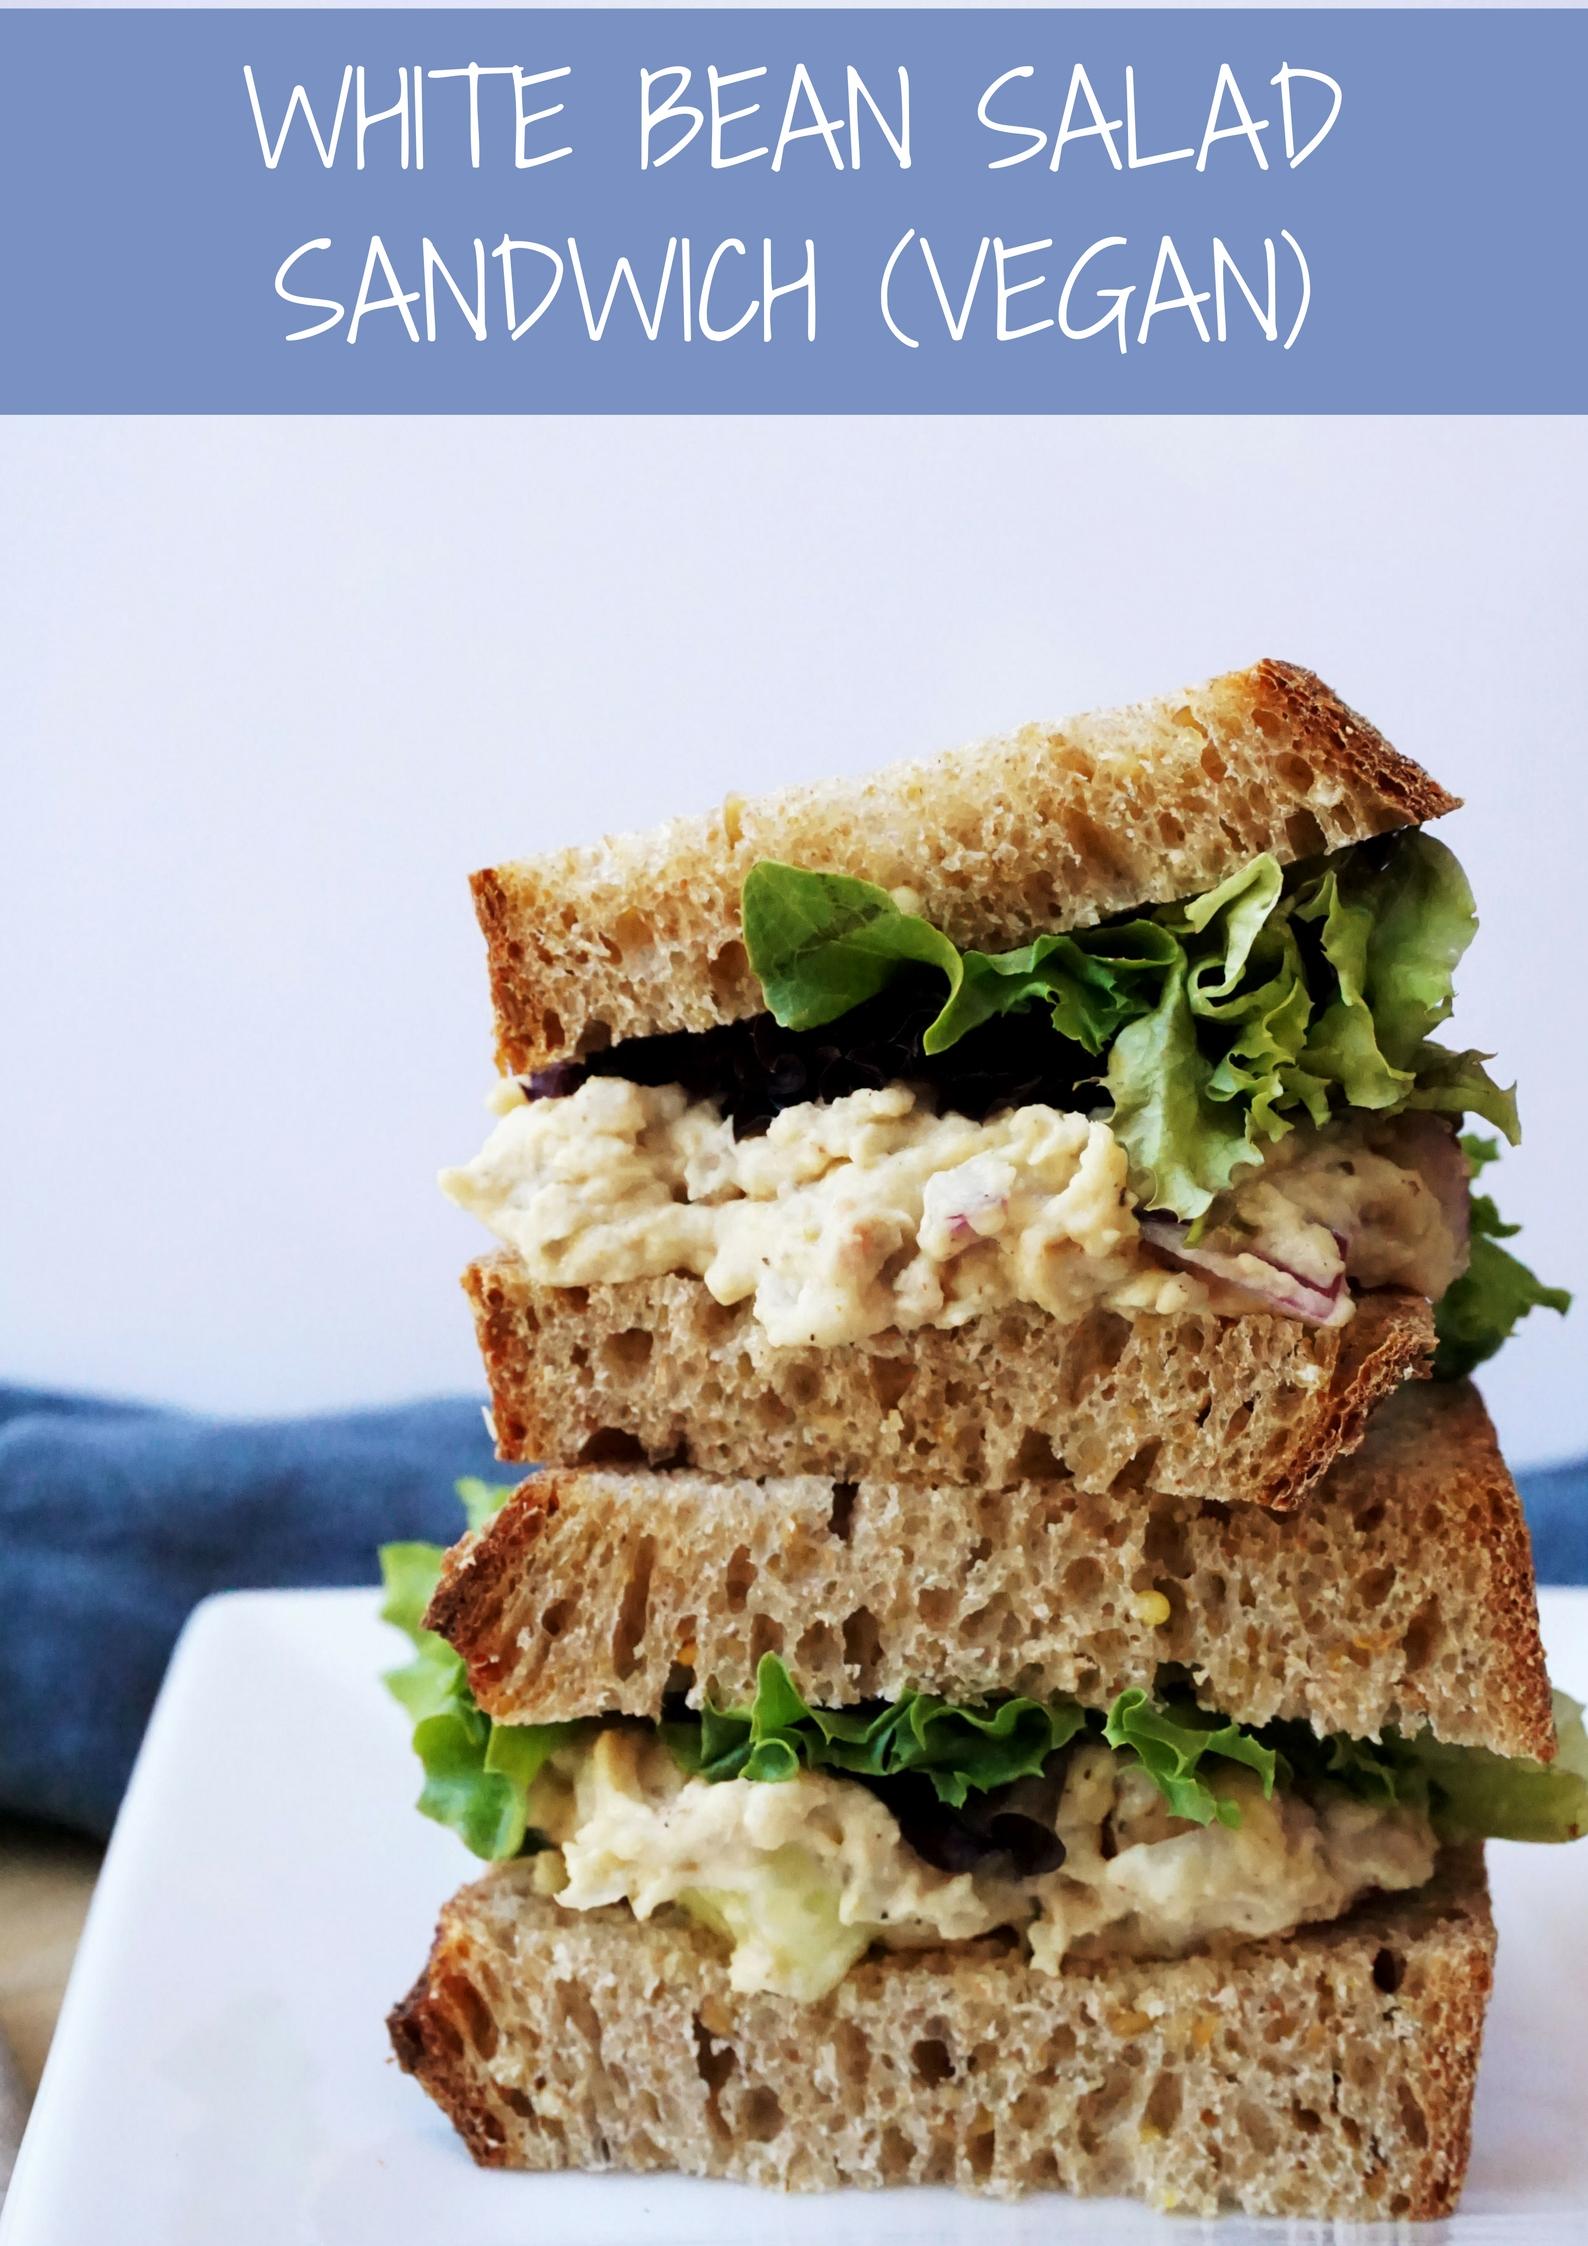 White Bean Salad Sandwich (Vegan, GF option)